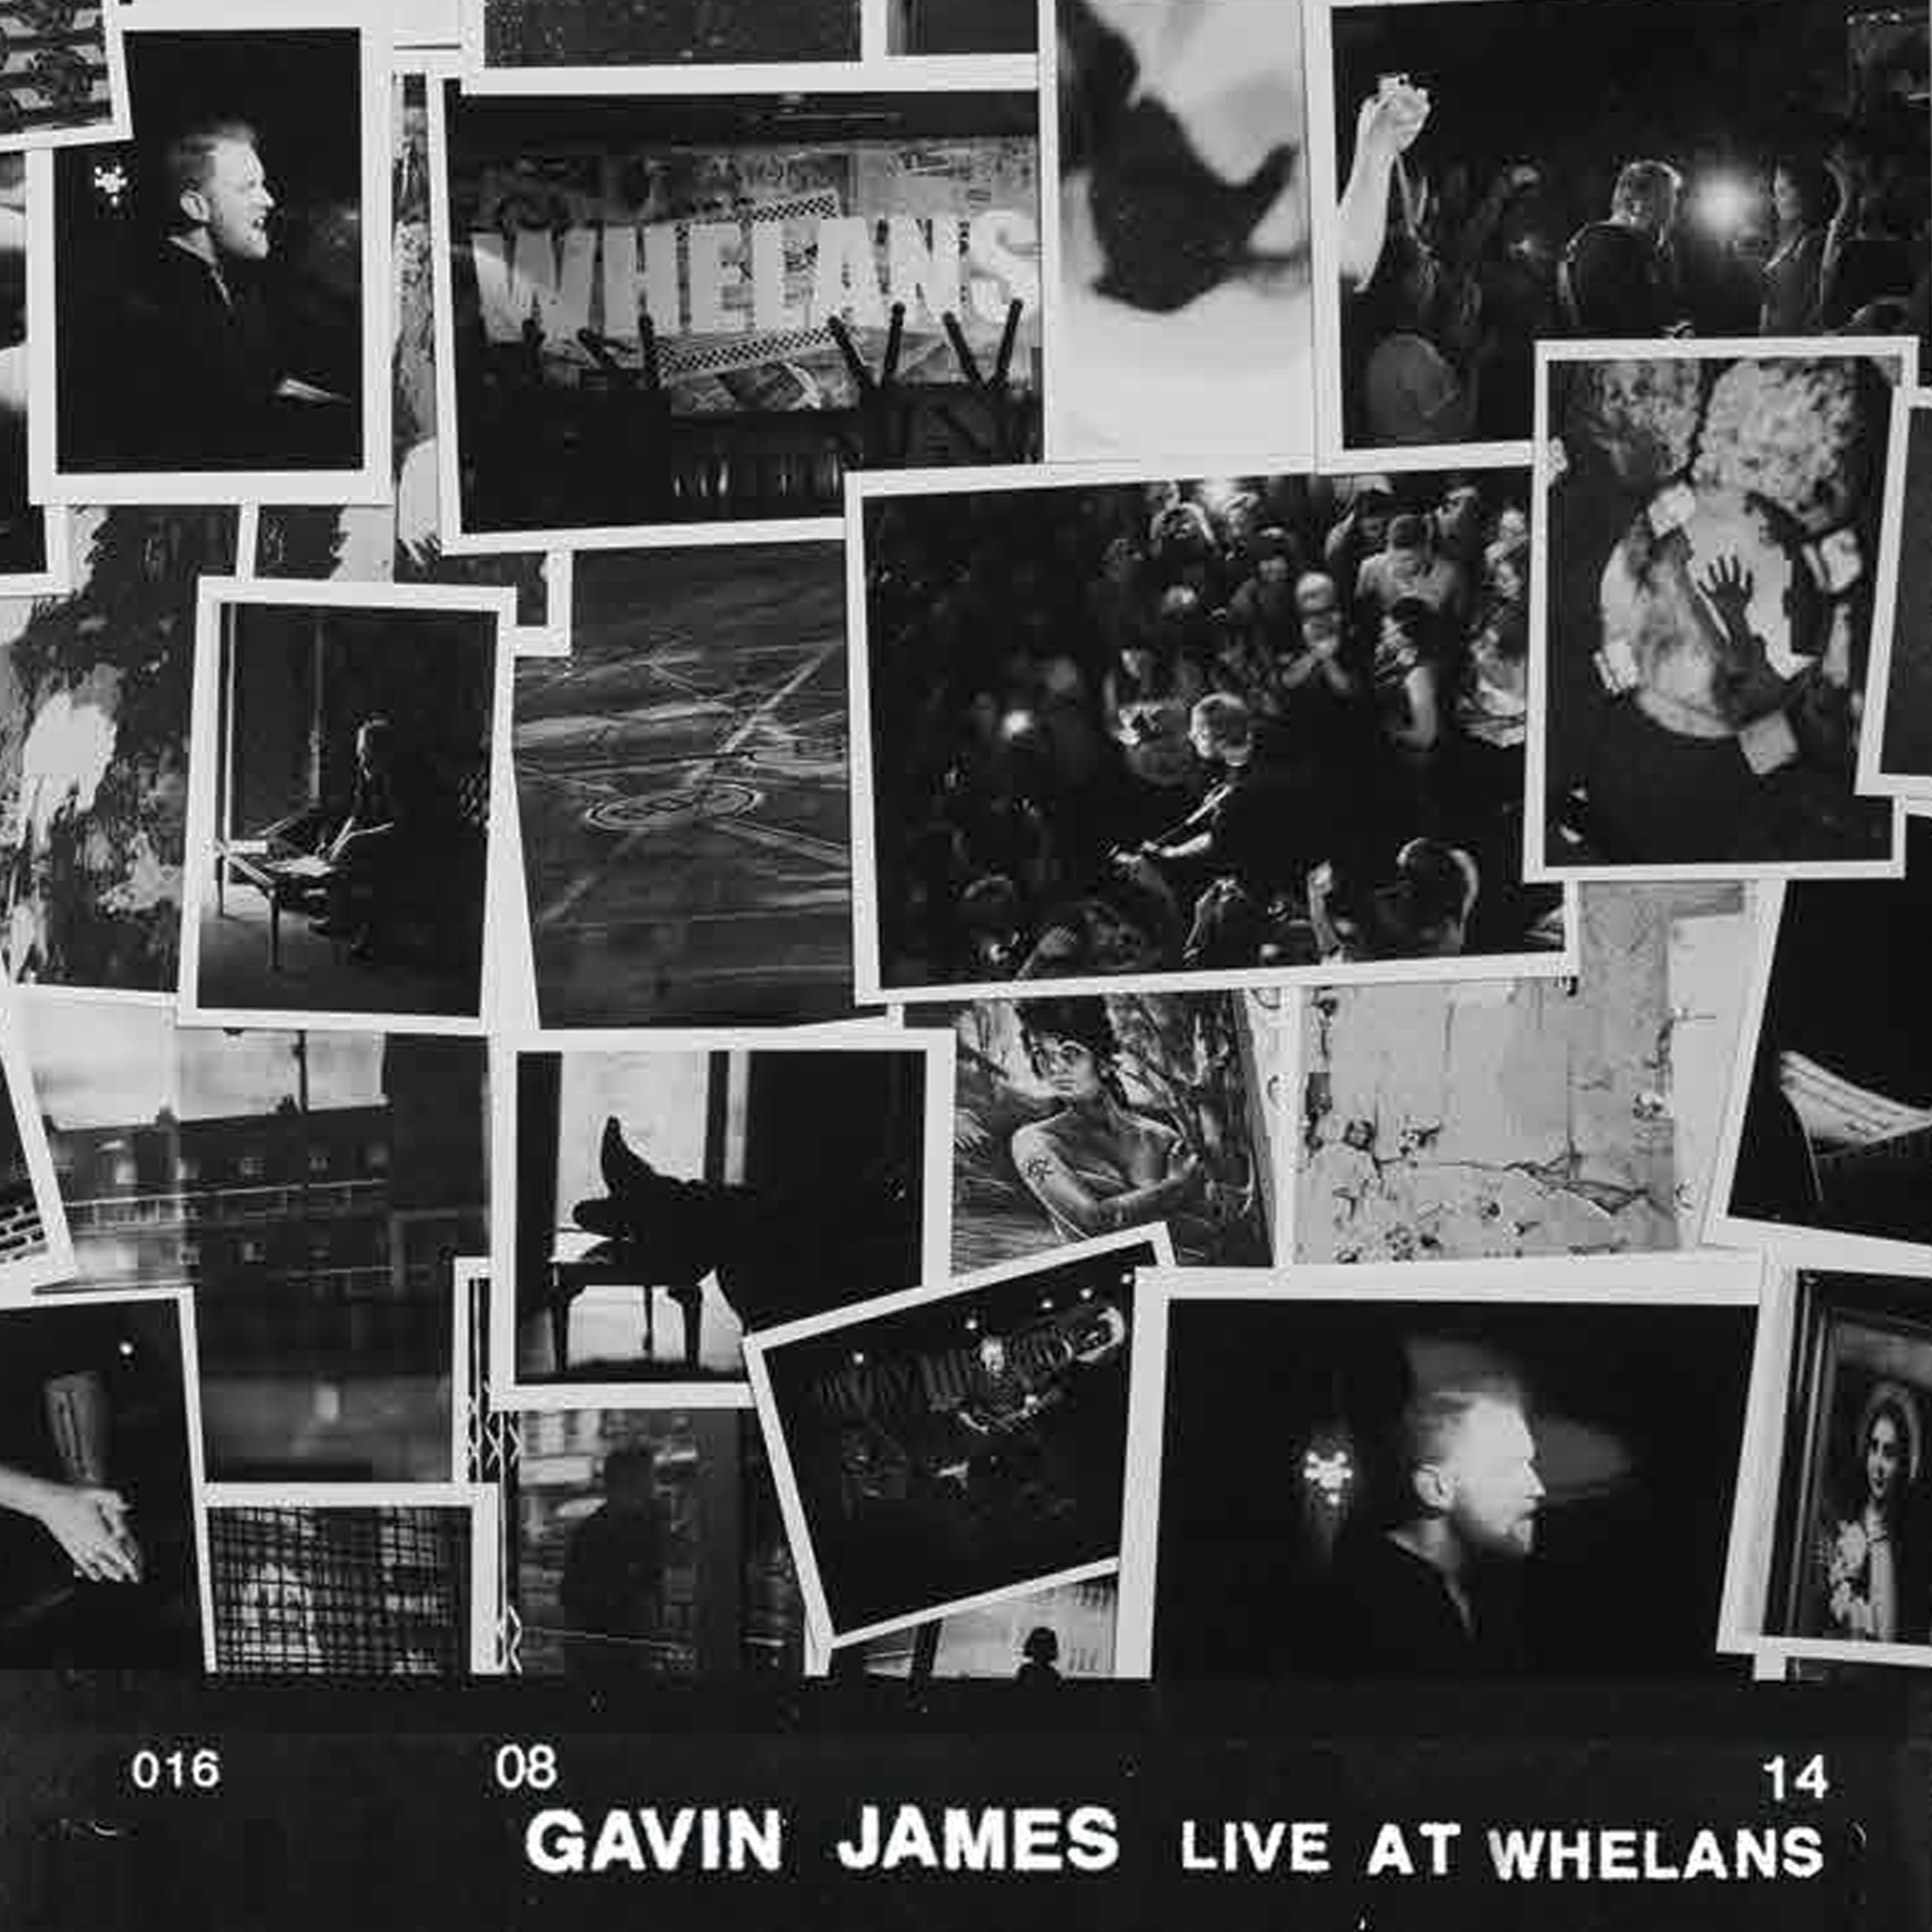 Gavin James - Live At Whelans (Vinyl)